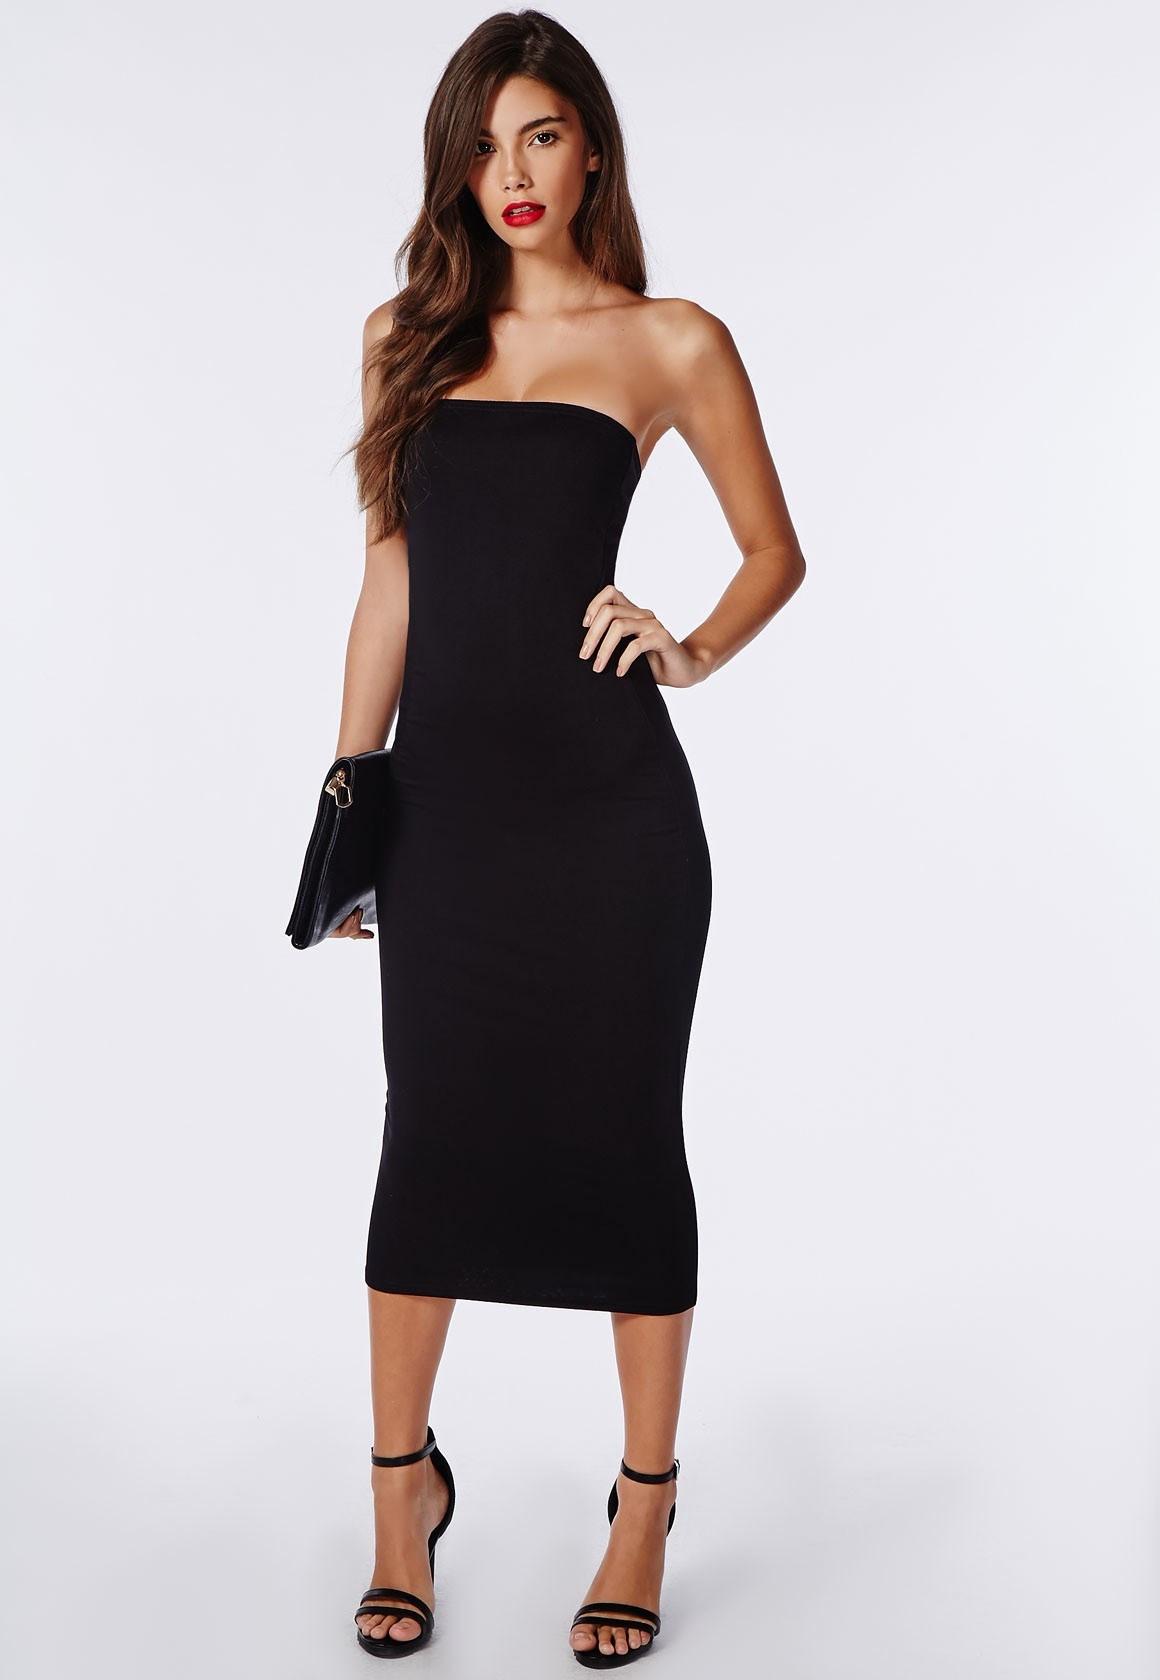 Plus size vinyl bodycon dress